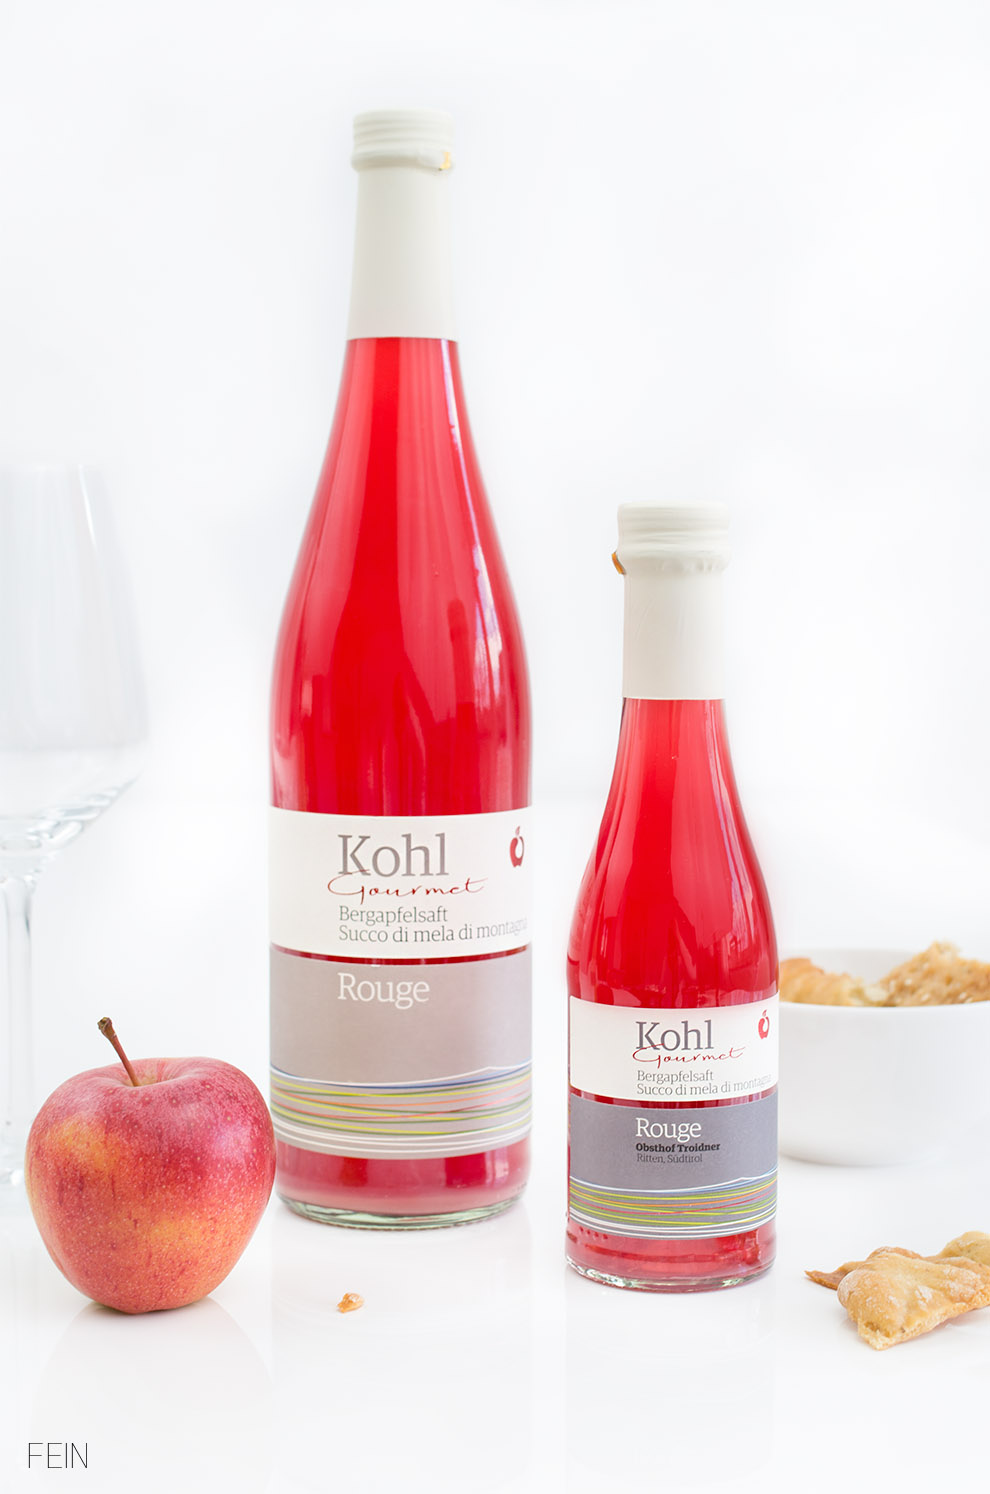 Apflsaft Kohl Rouge